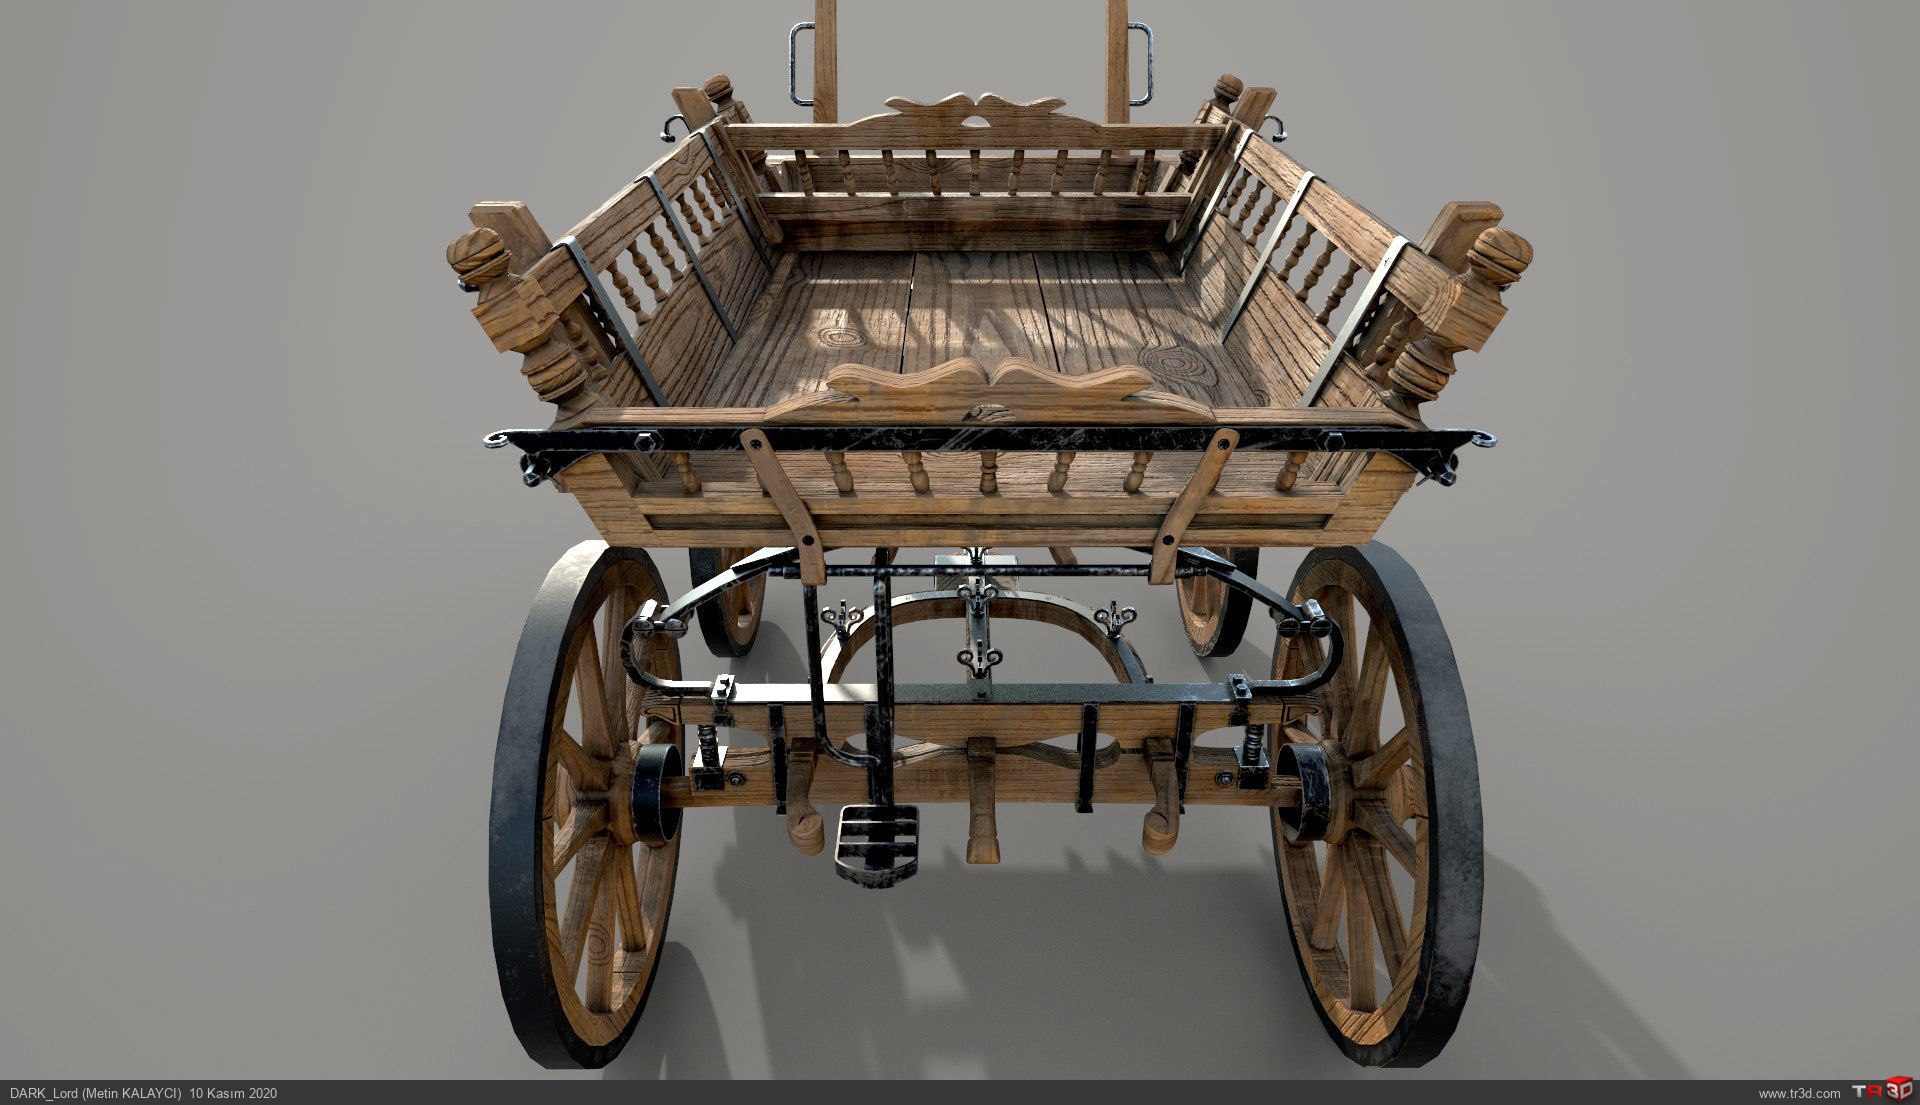 At arabası 1